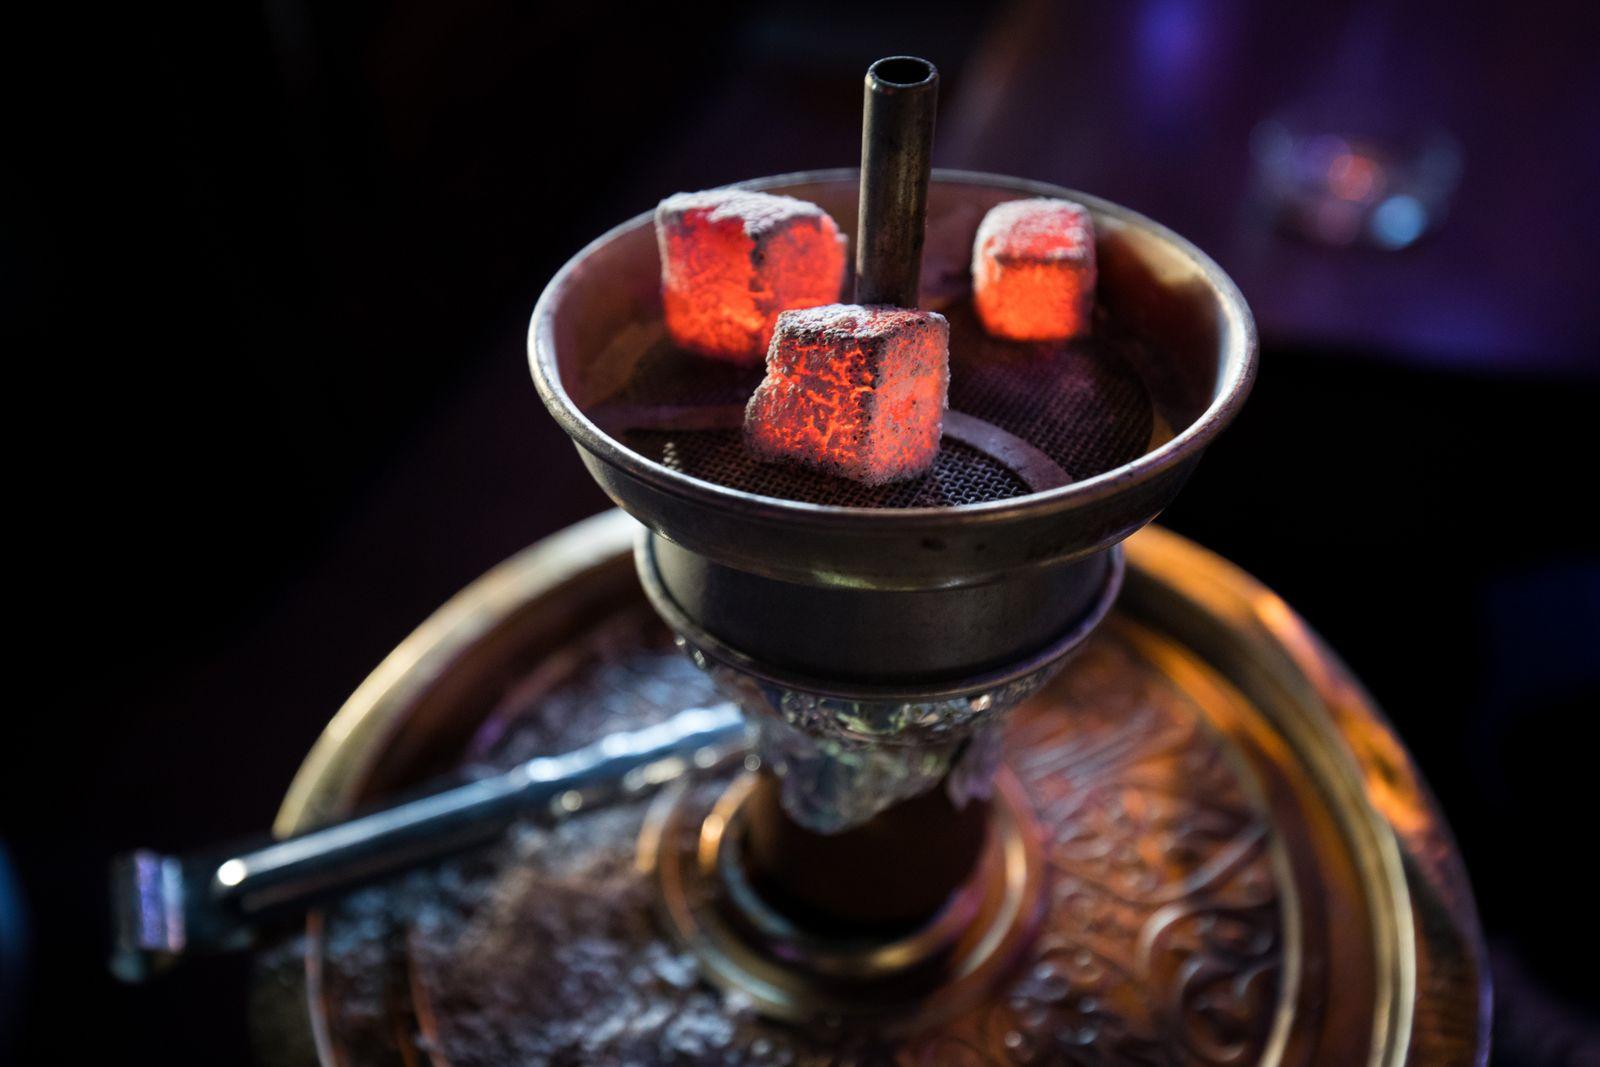 Gesetzentwurf zu Shisha-Bars in Hamburg